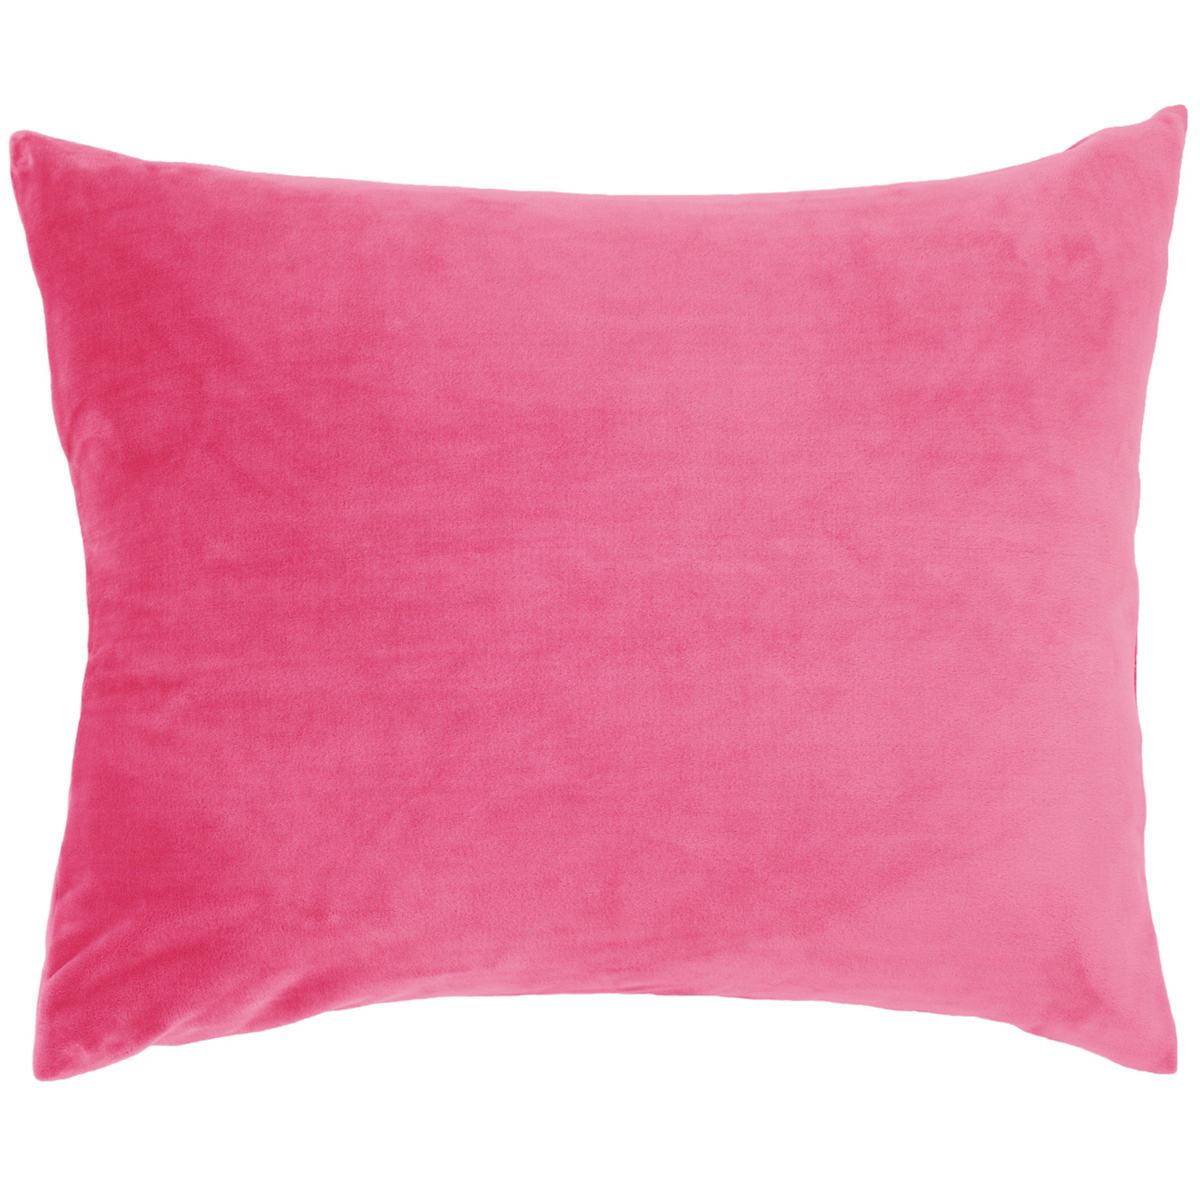 Selke Fleece Fuchsia Decorative Pillow